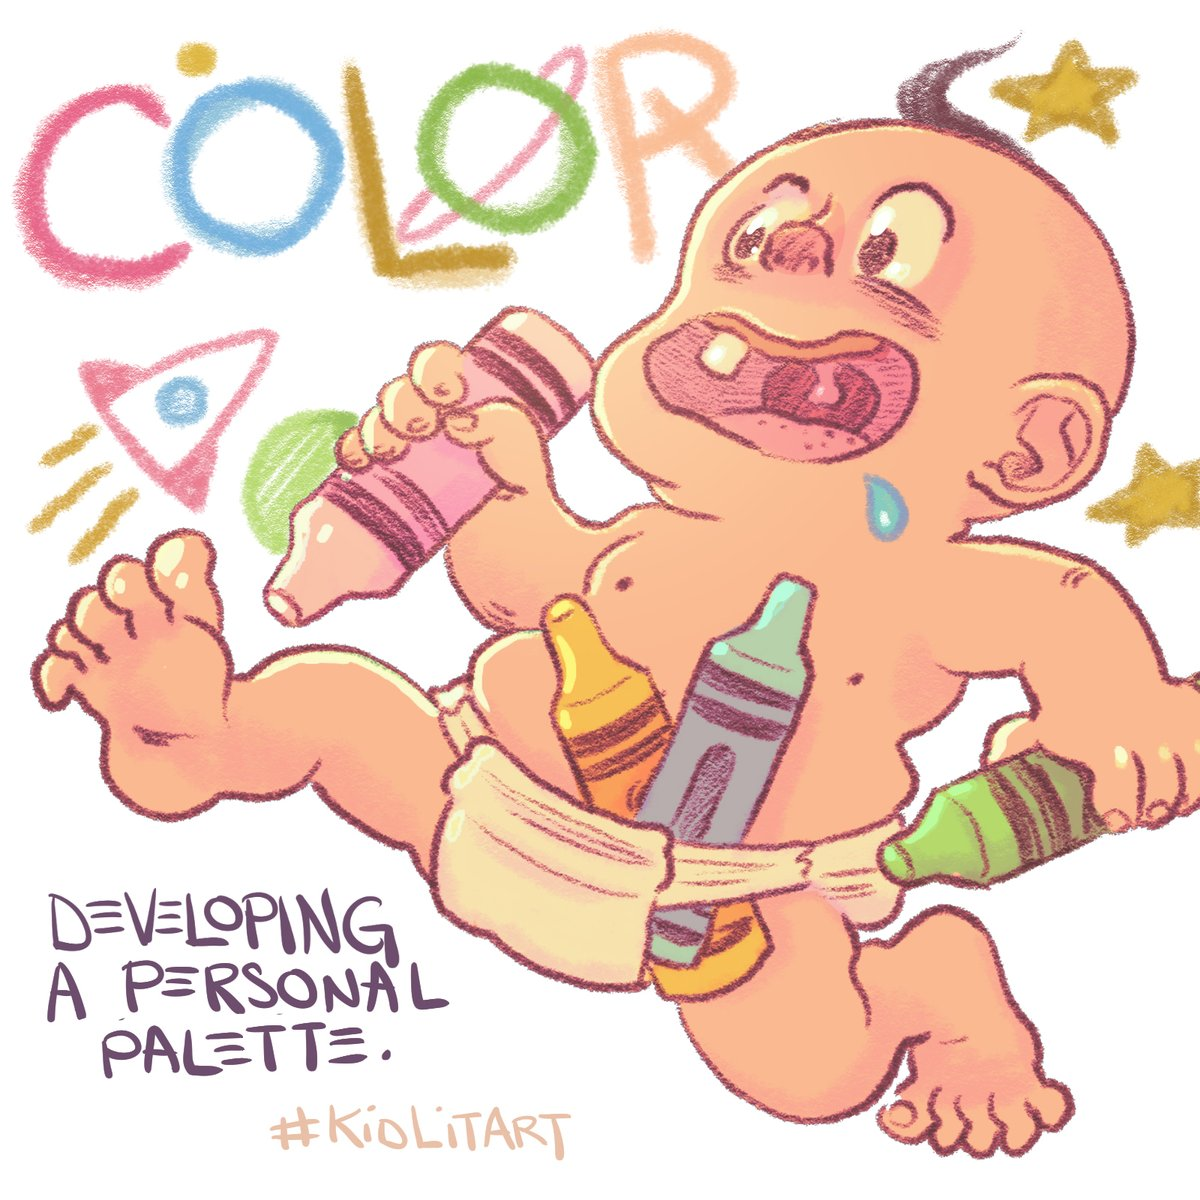 Thumbnail for #kidlitart Developing Your Color Palette 3-23-2017